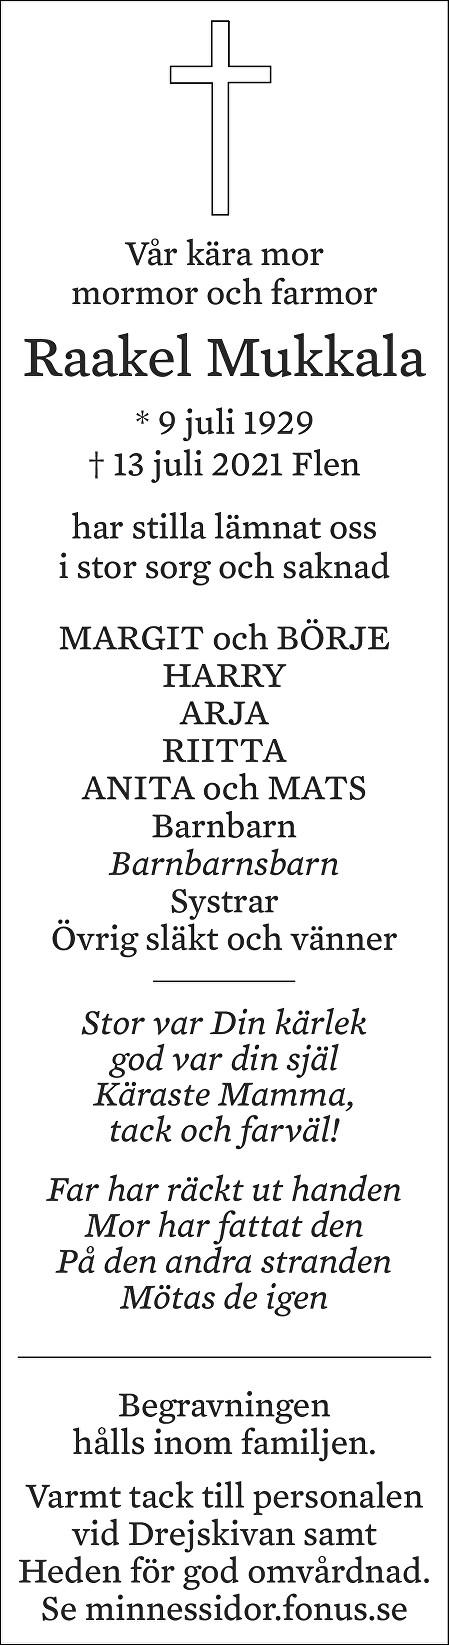 Raakel Mukkala Death notice